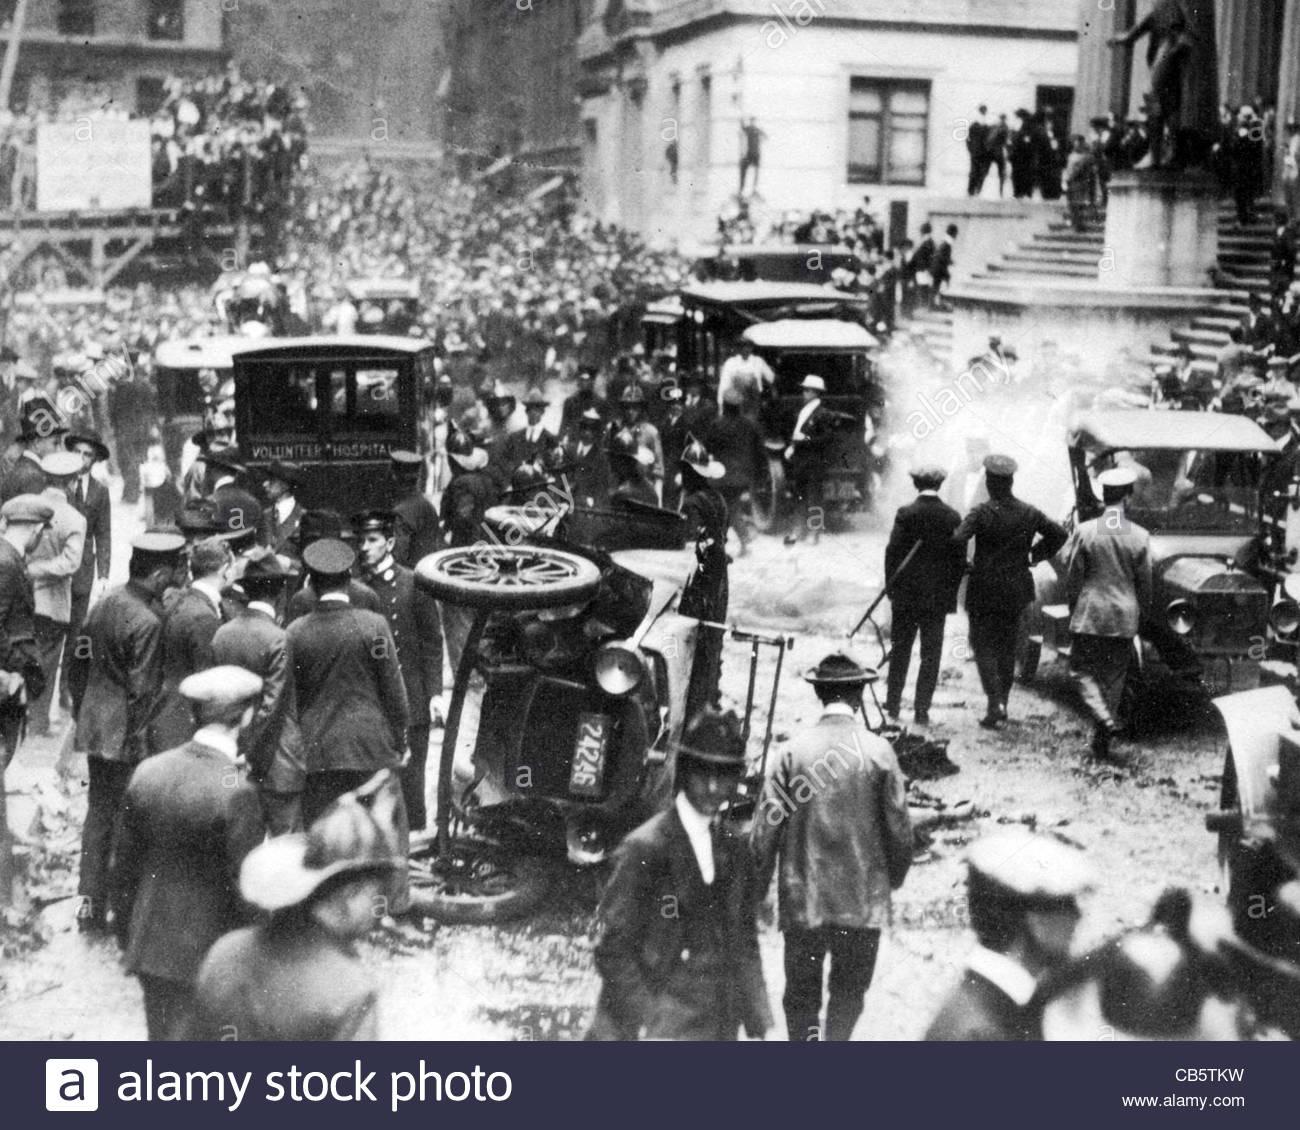 wall-street-esplosione-16-settembre-1920-conse.jpg